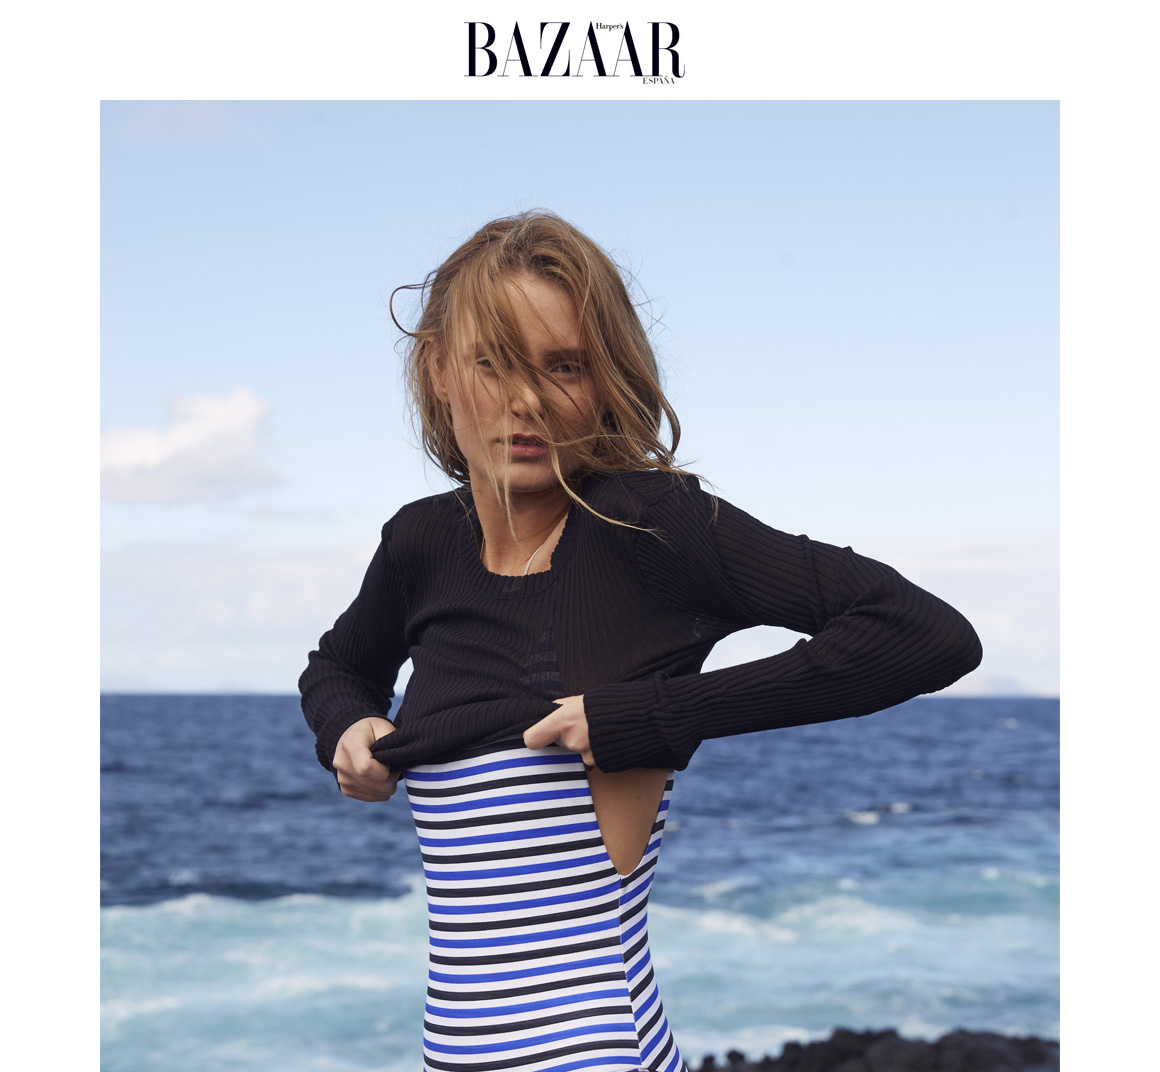 NOW_THEN Harper's Bazaar Alona swimwear